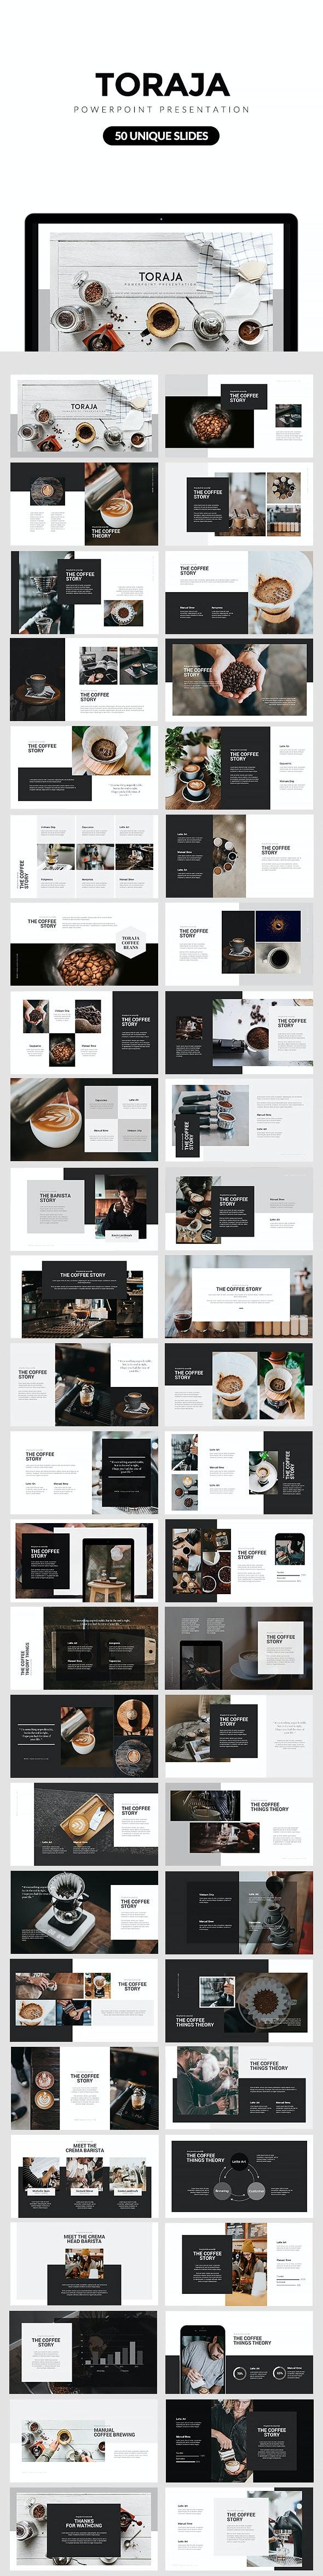 Toraja Powerpoint Template - Creative PowerPoint Templates